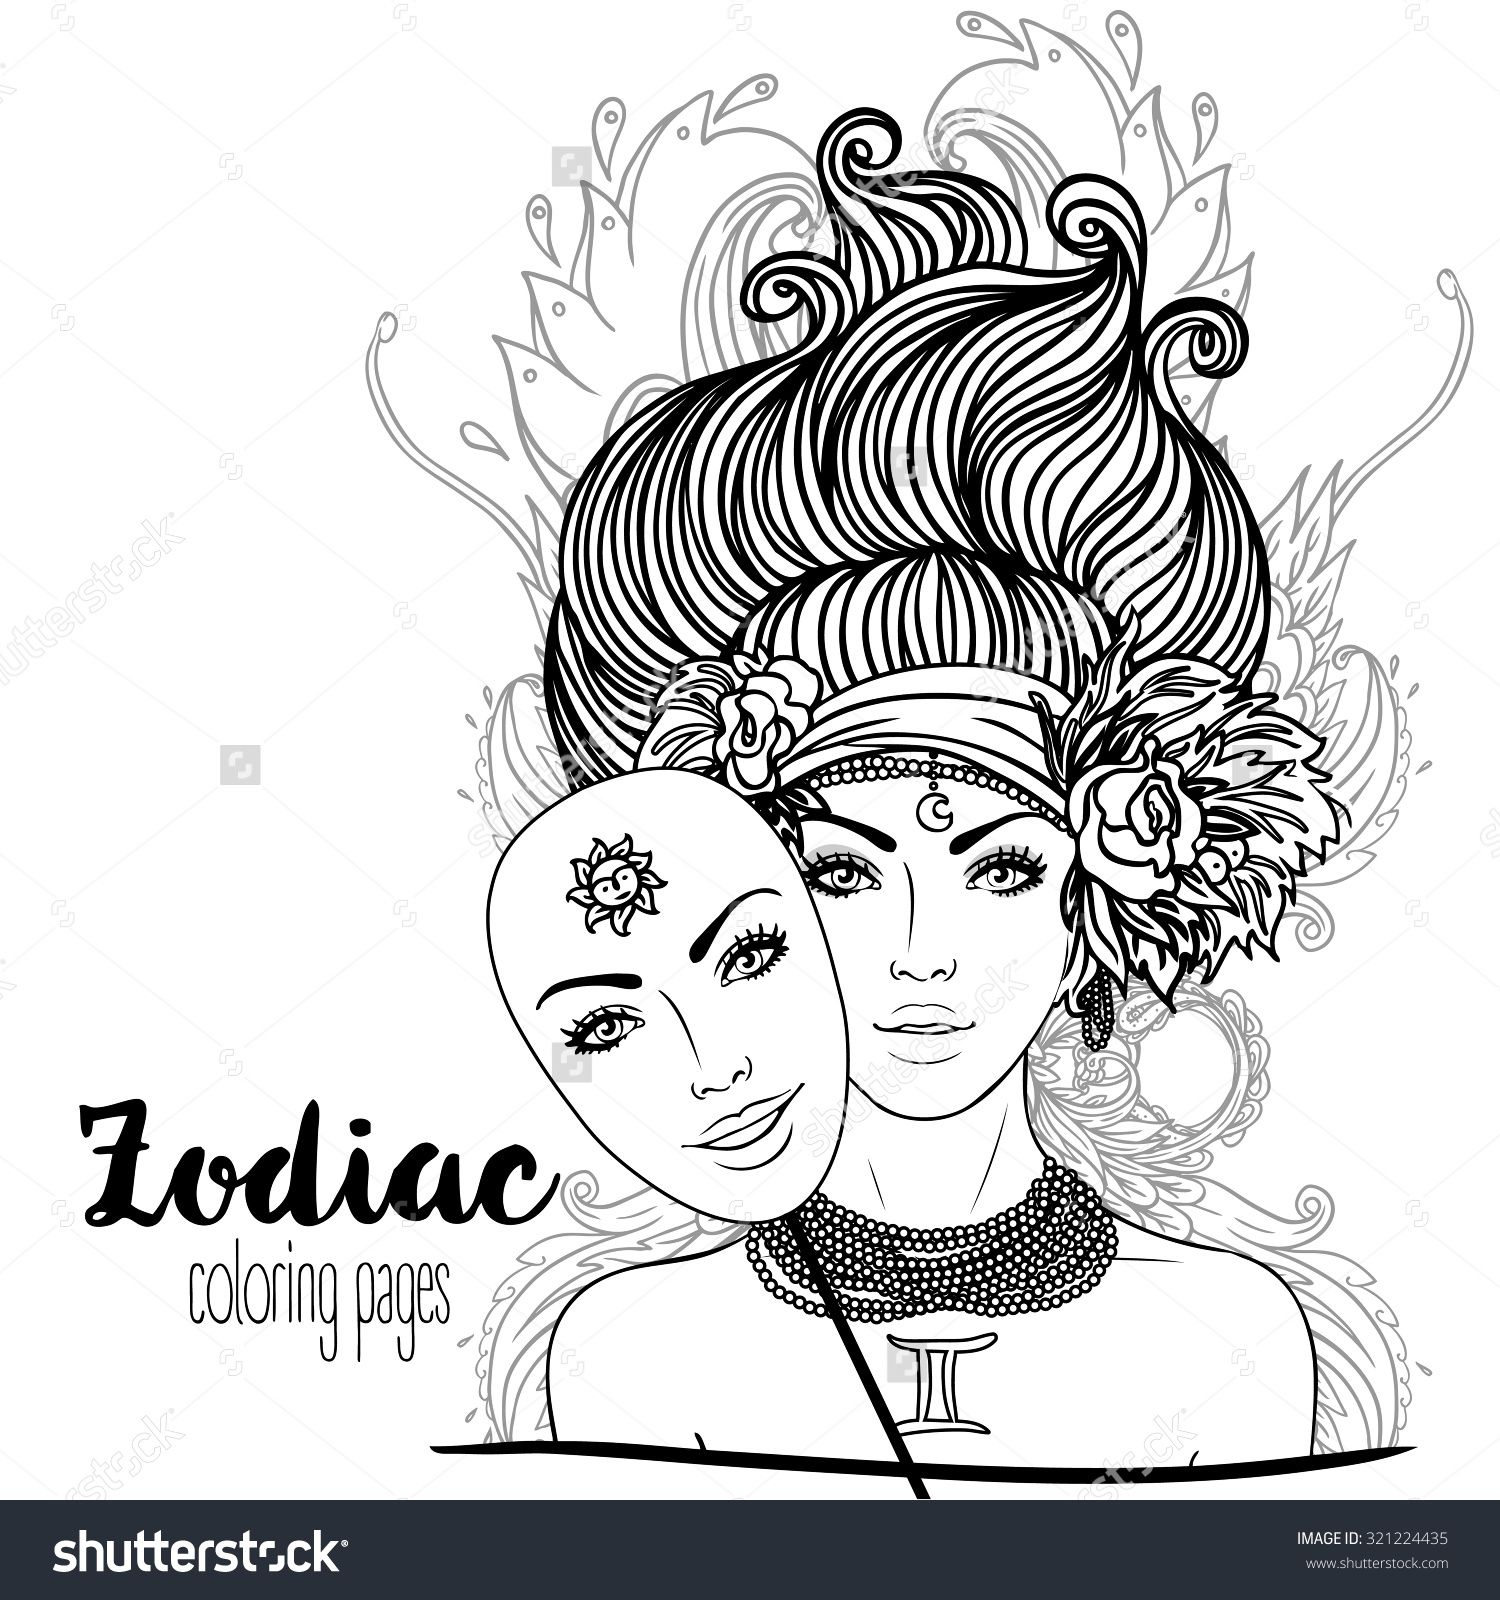 Zodiac Illustration Of Gemini Zodiac Sign As A Beautiful